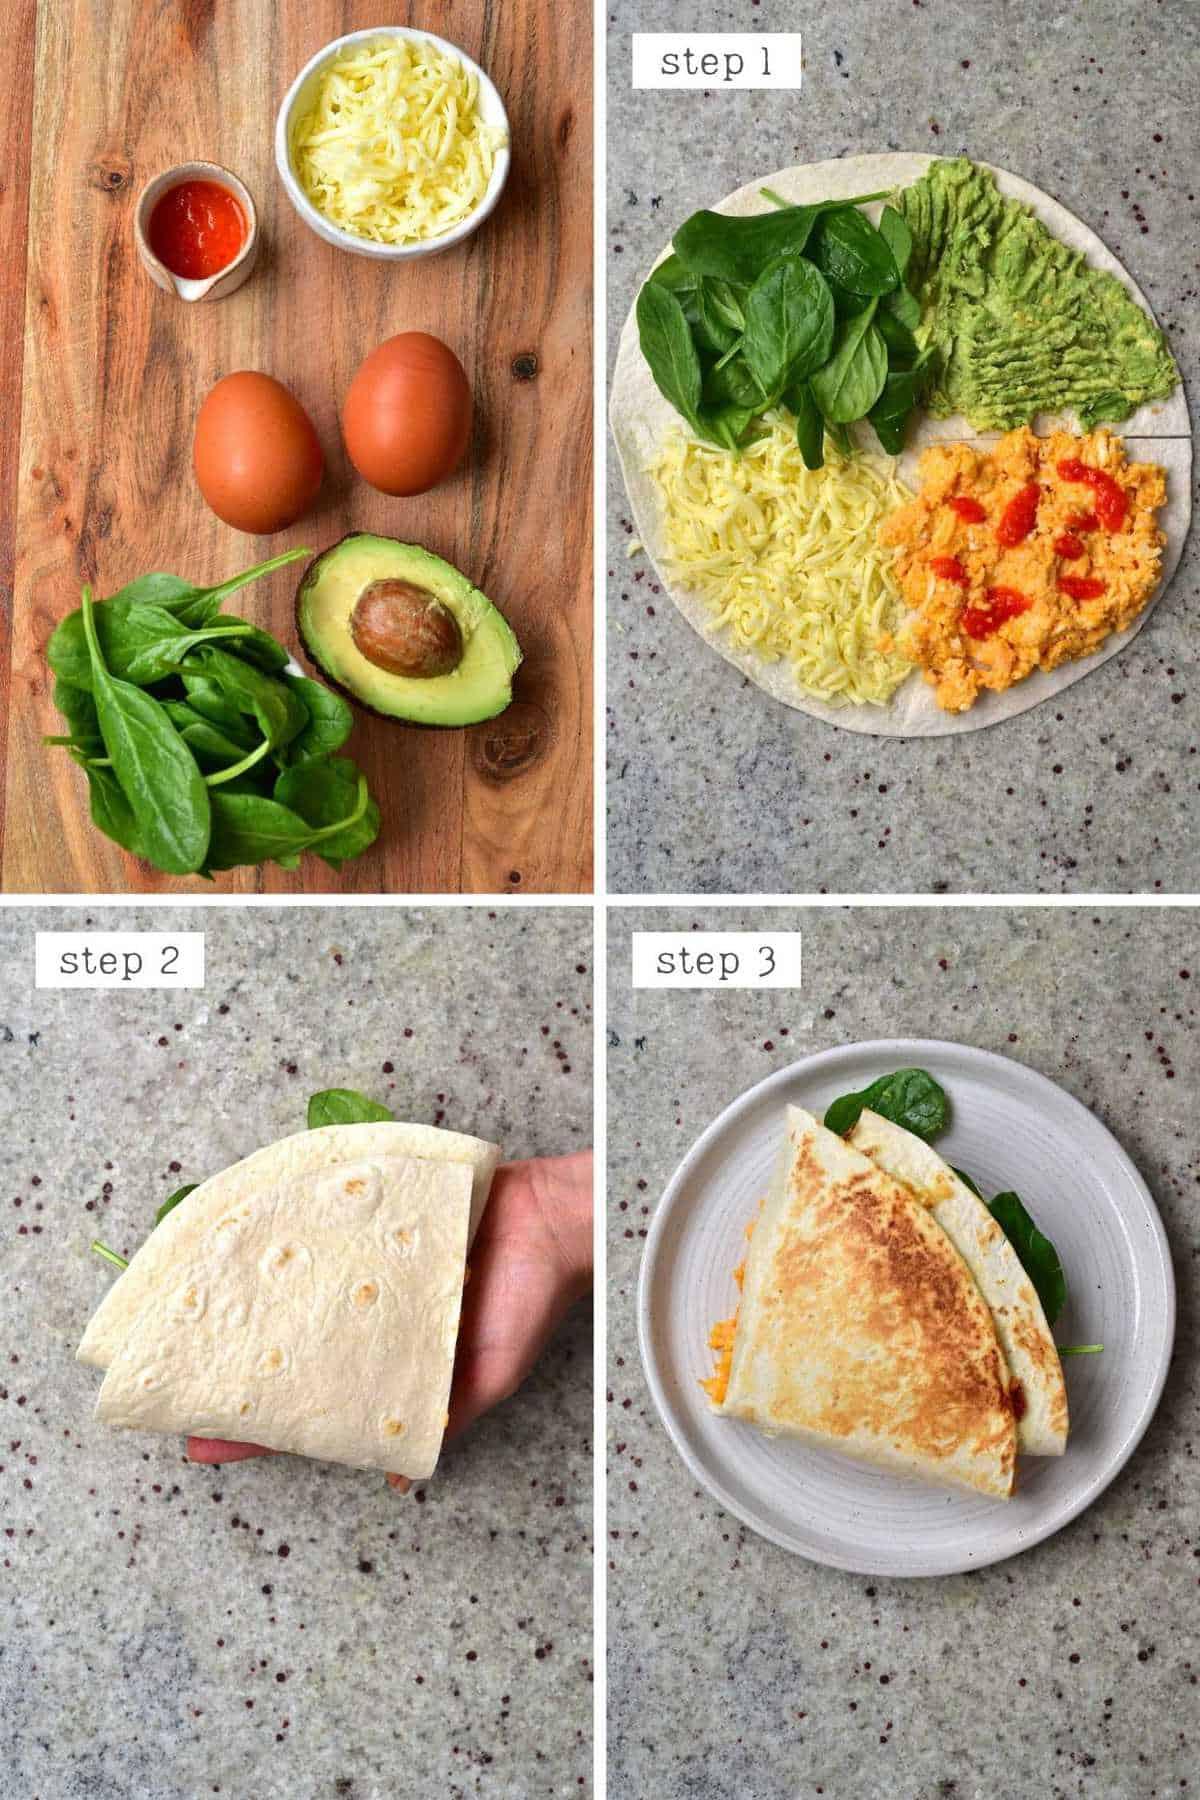 Steps for making breakfast tortilla - High protein breakfast wrap